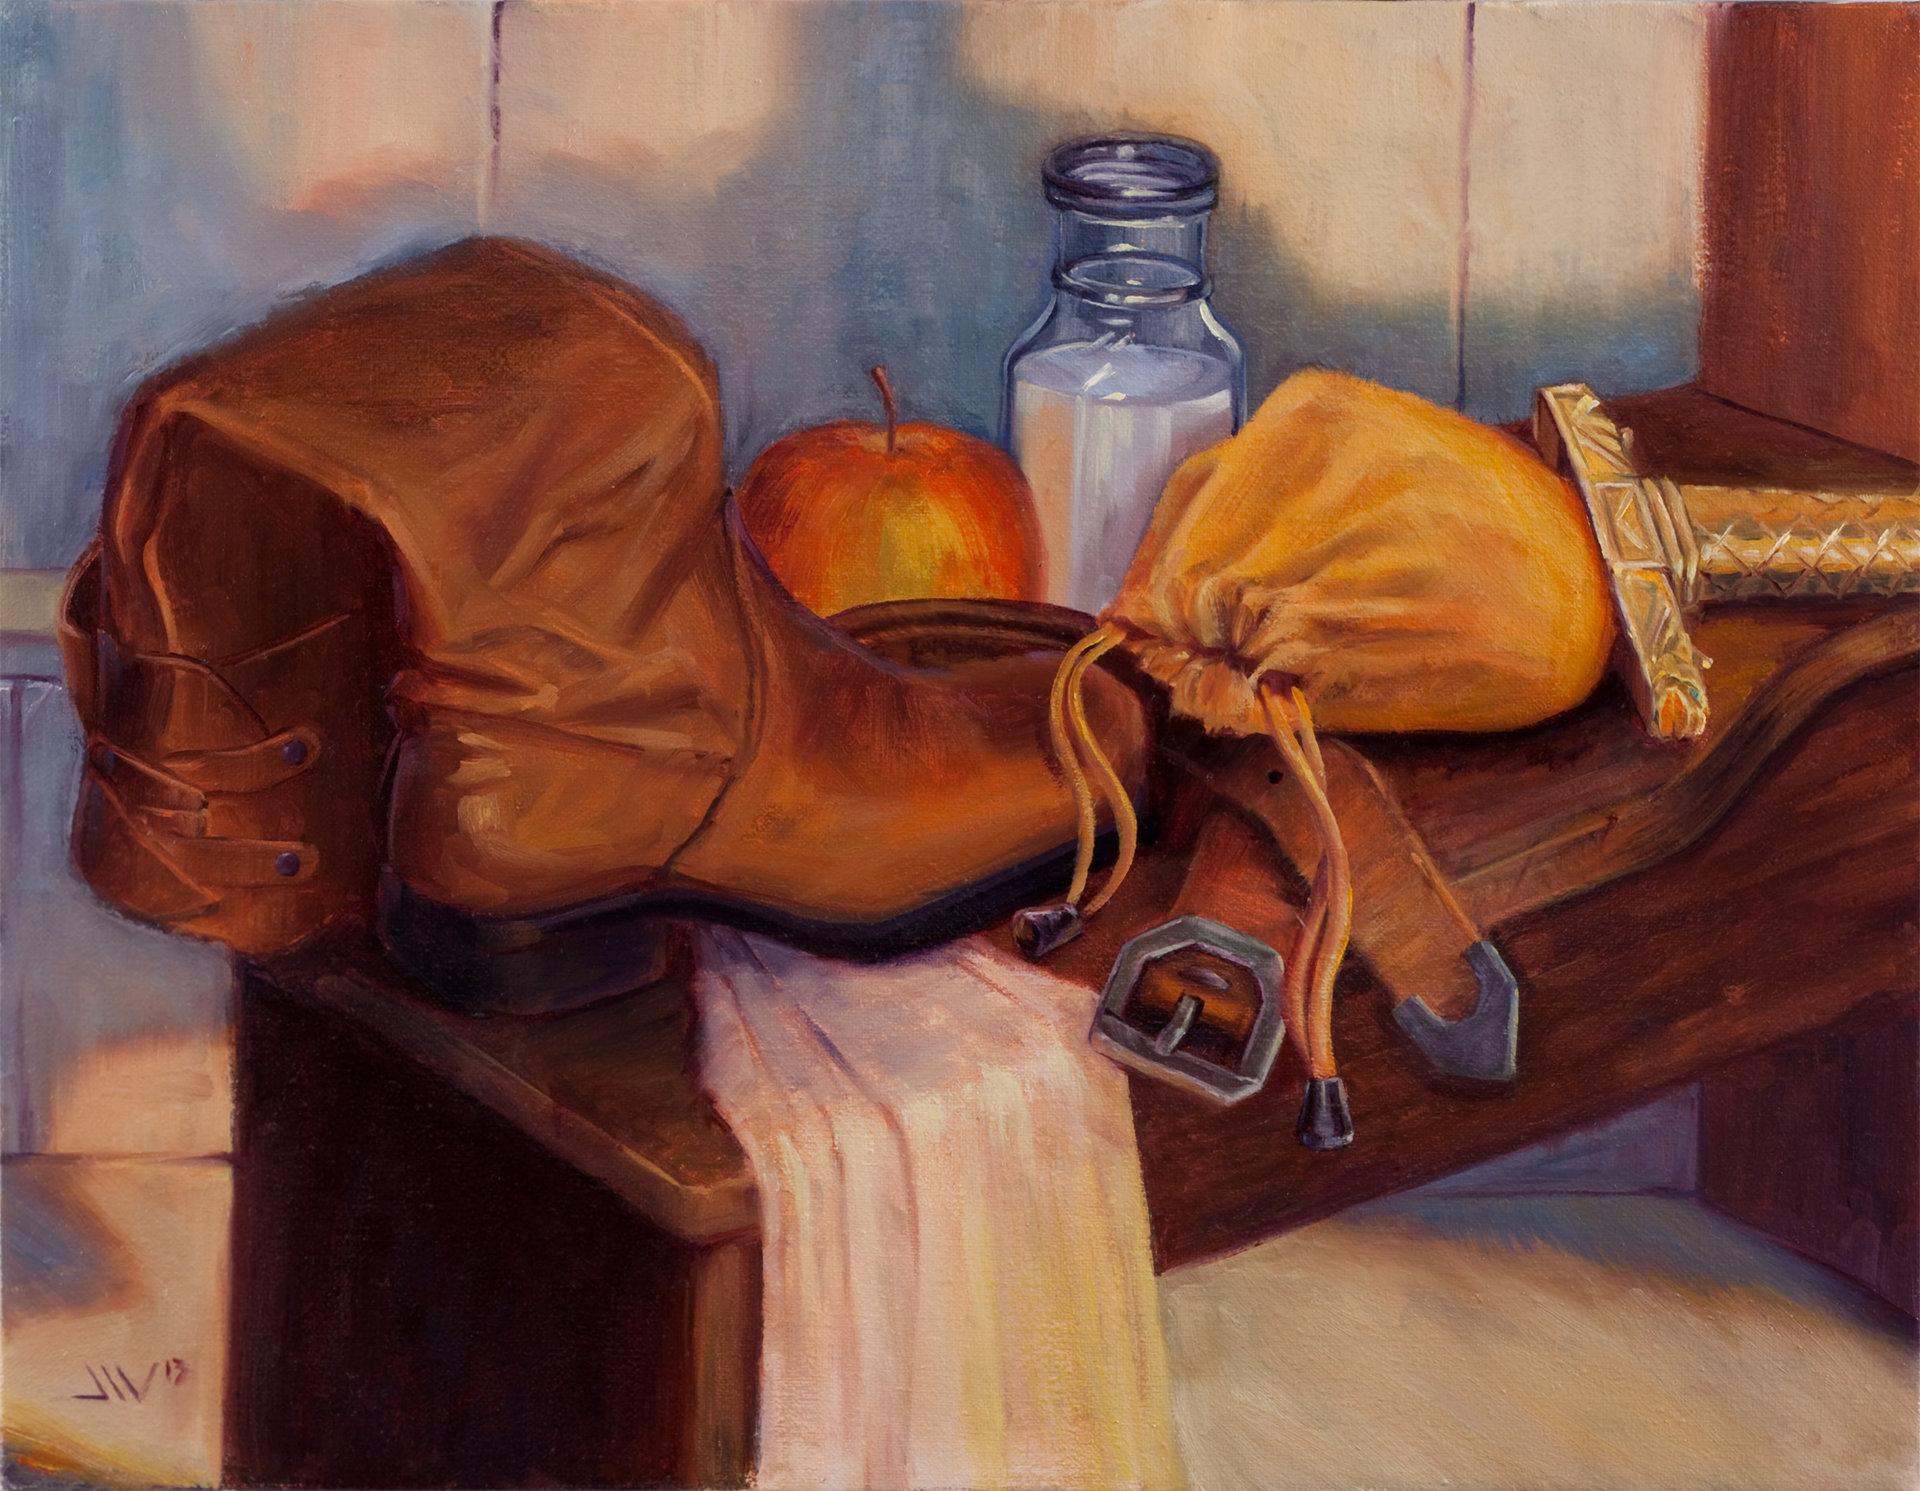 Joshua wilson shoes of the gospel of peace